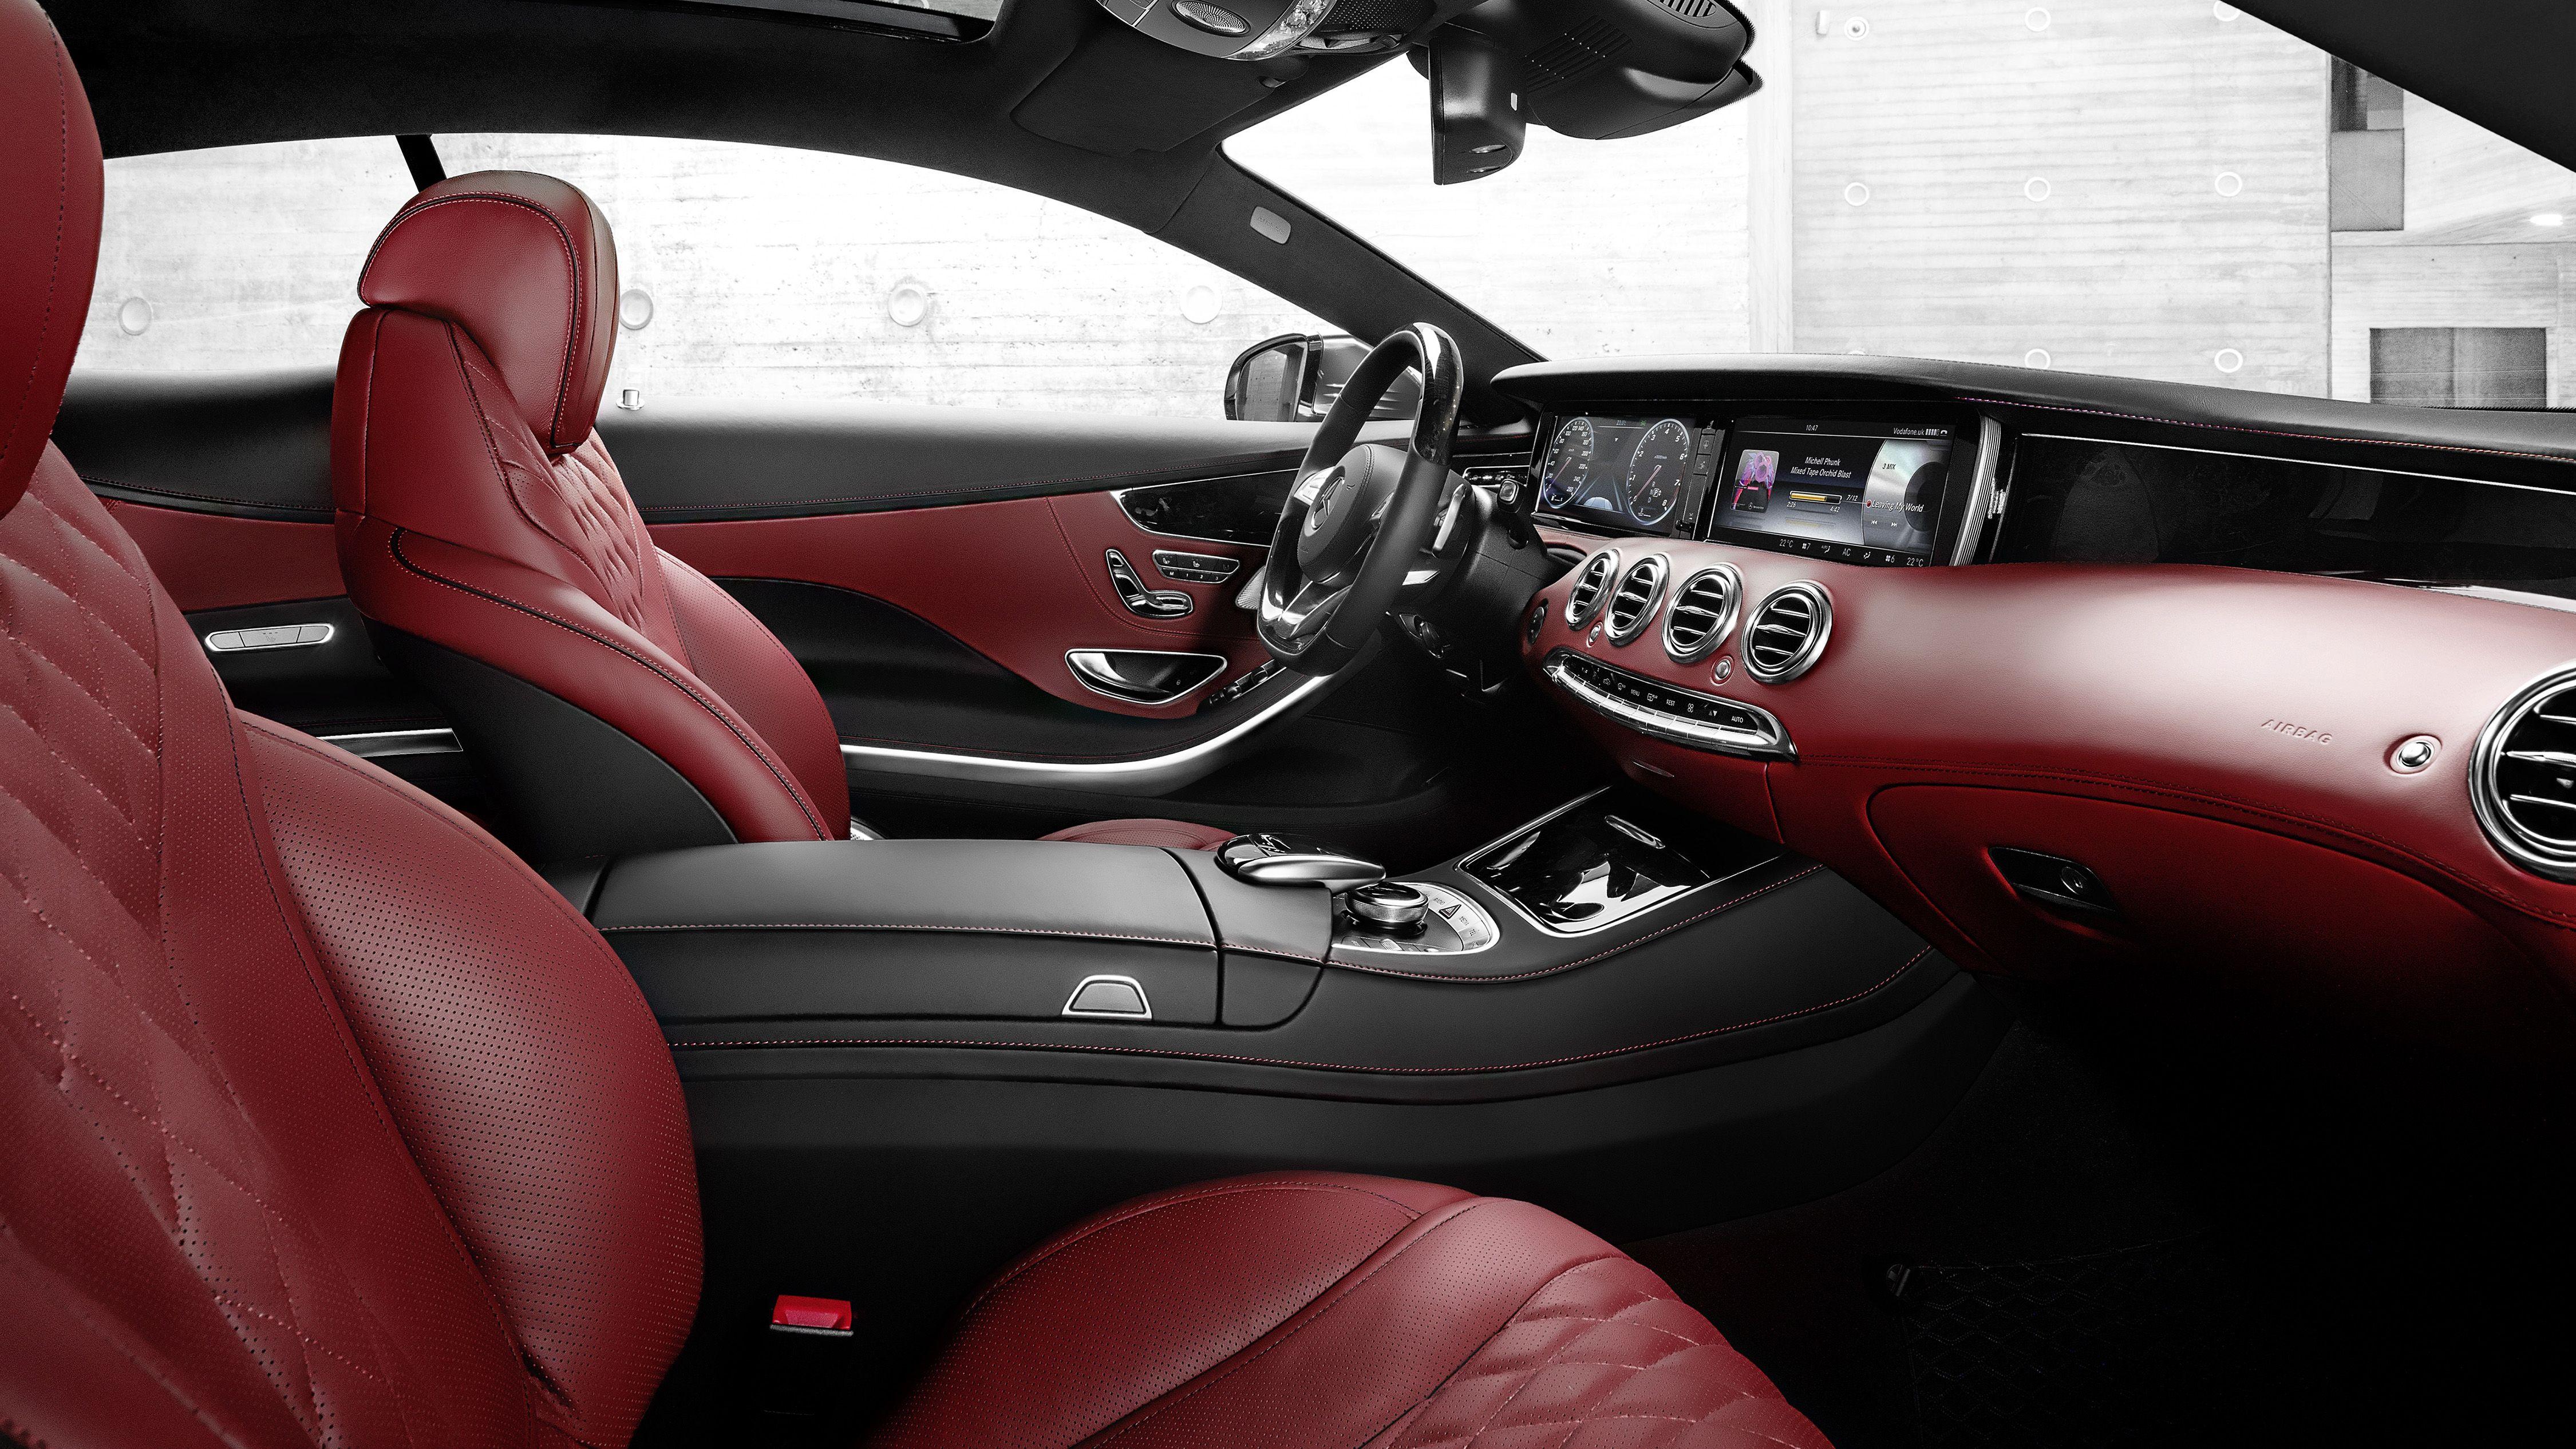 mercedes benz 2014 s class interior. 2014 mercedesbenz sclass coupe interior 10 wallpaper mercedes benz s class